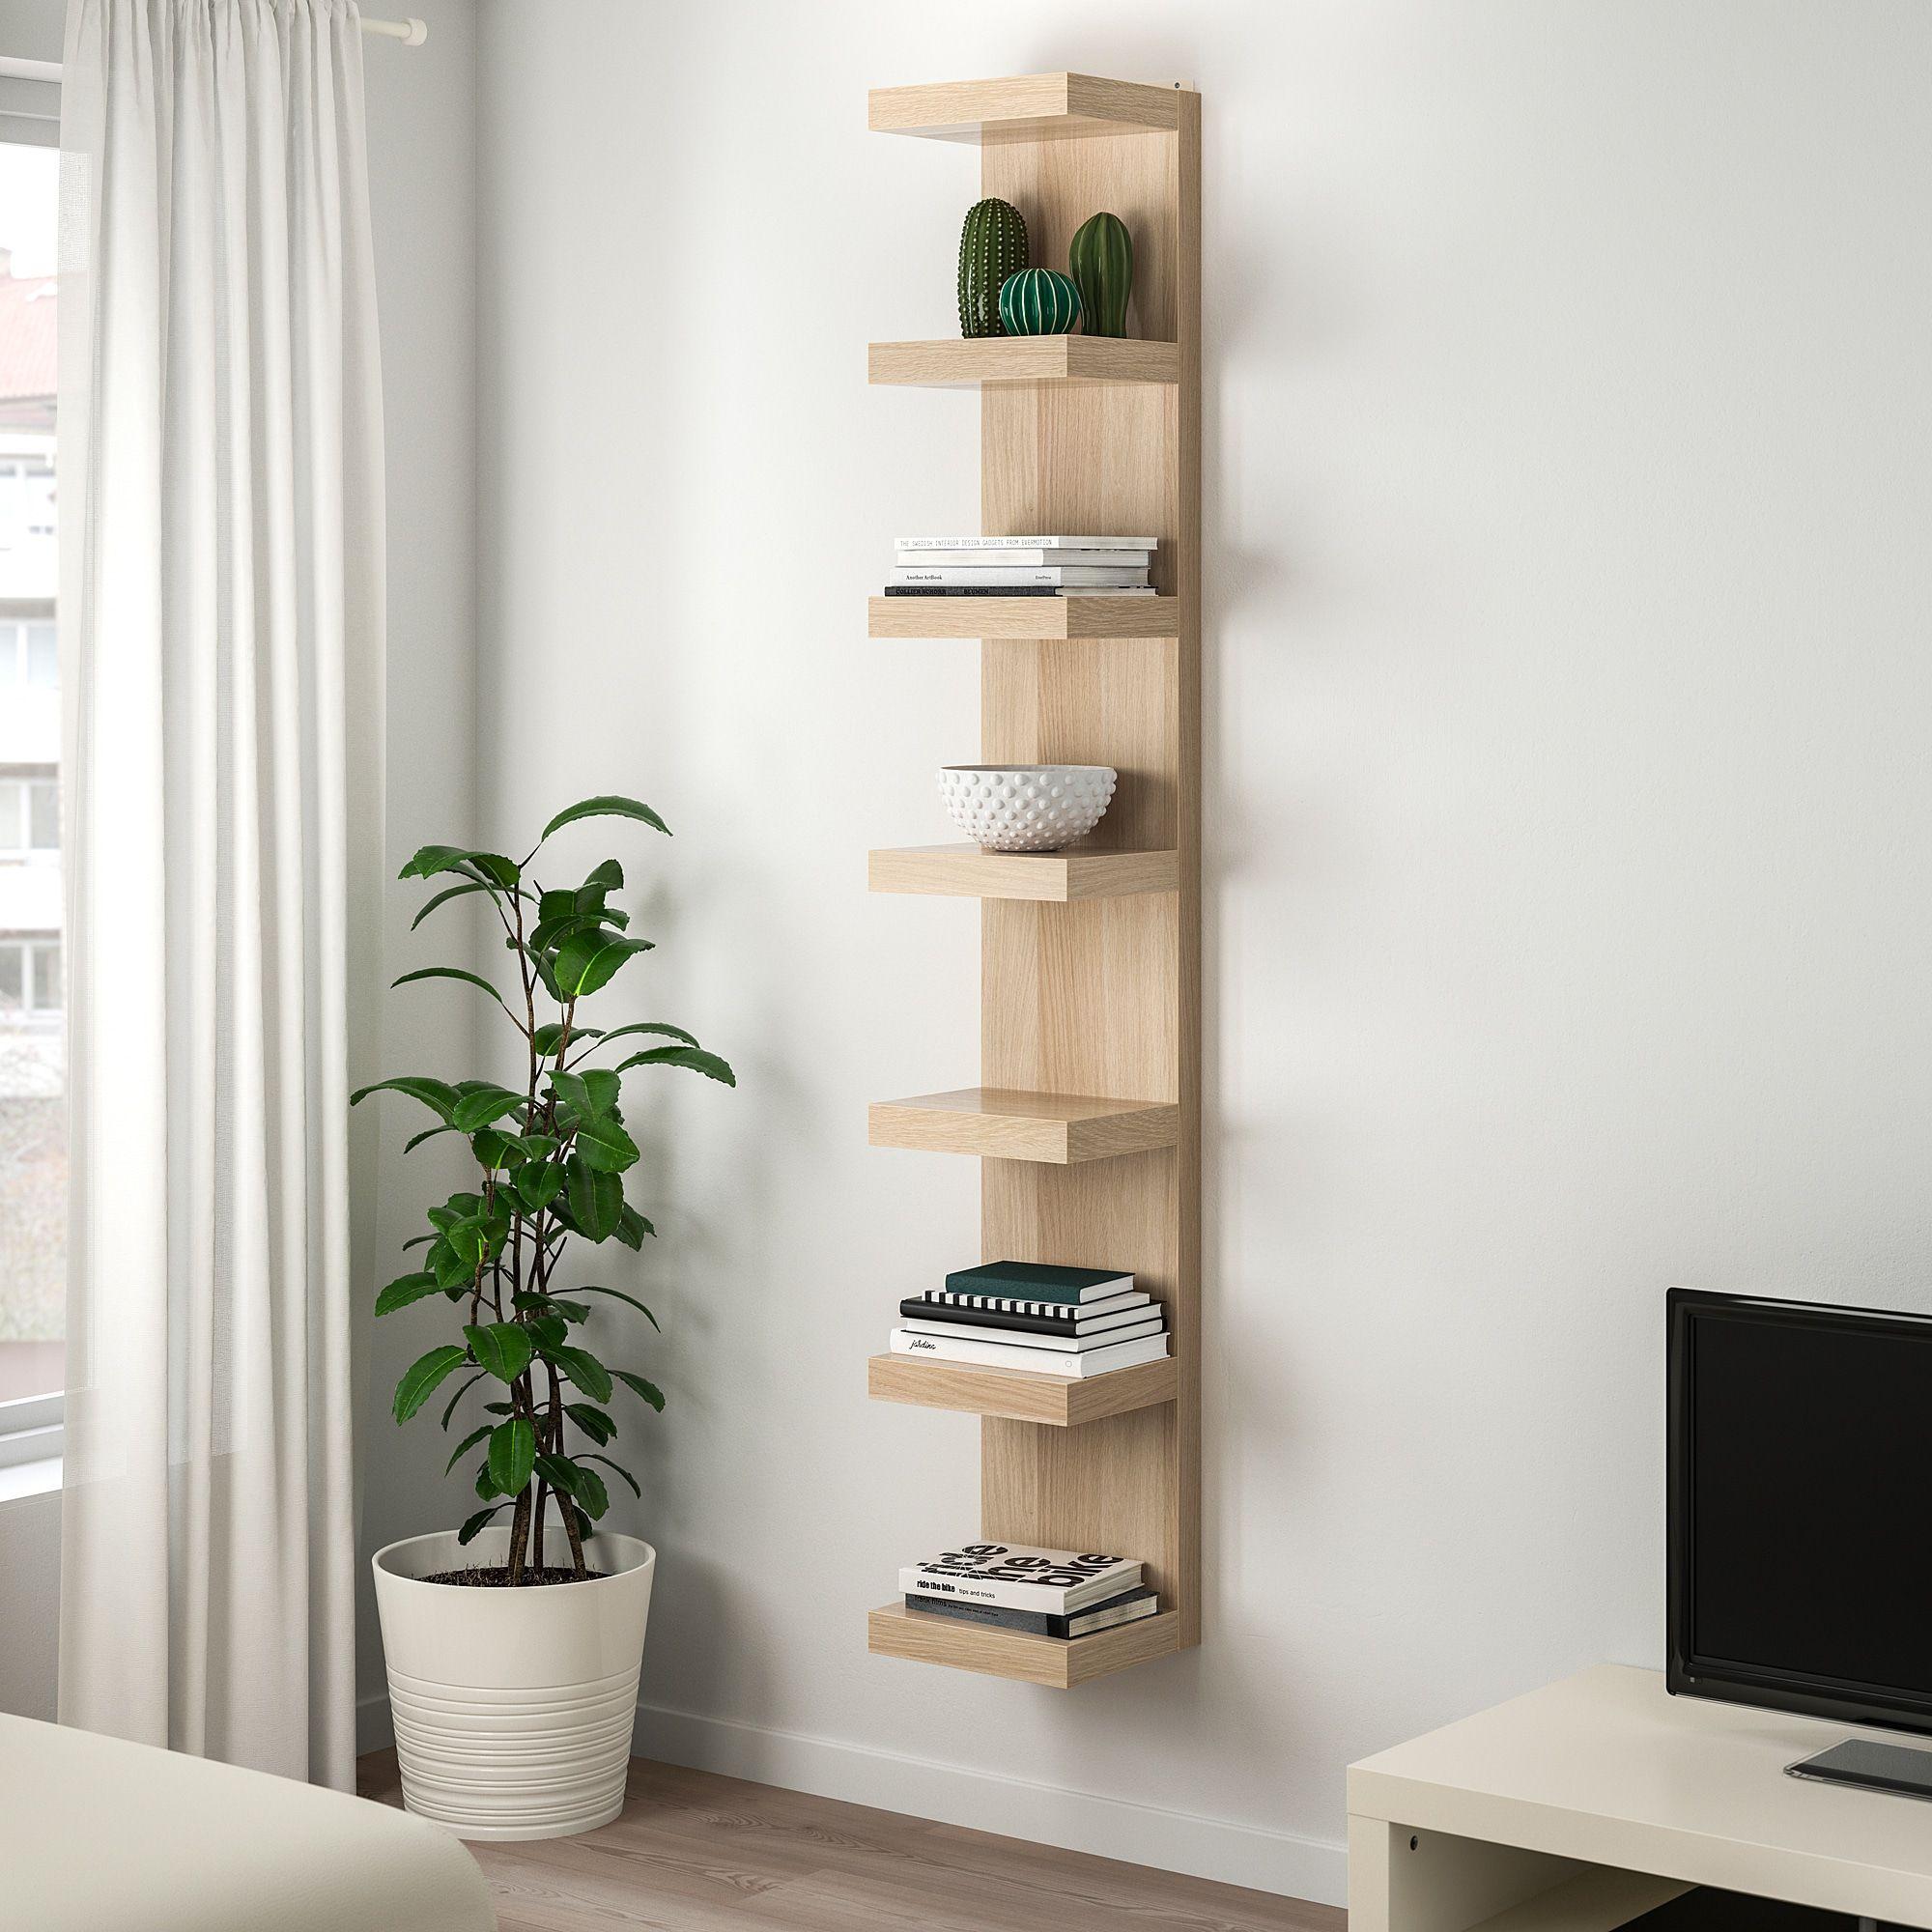 Wall Mounted Shelving Units Ikea